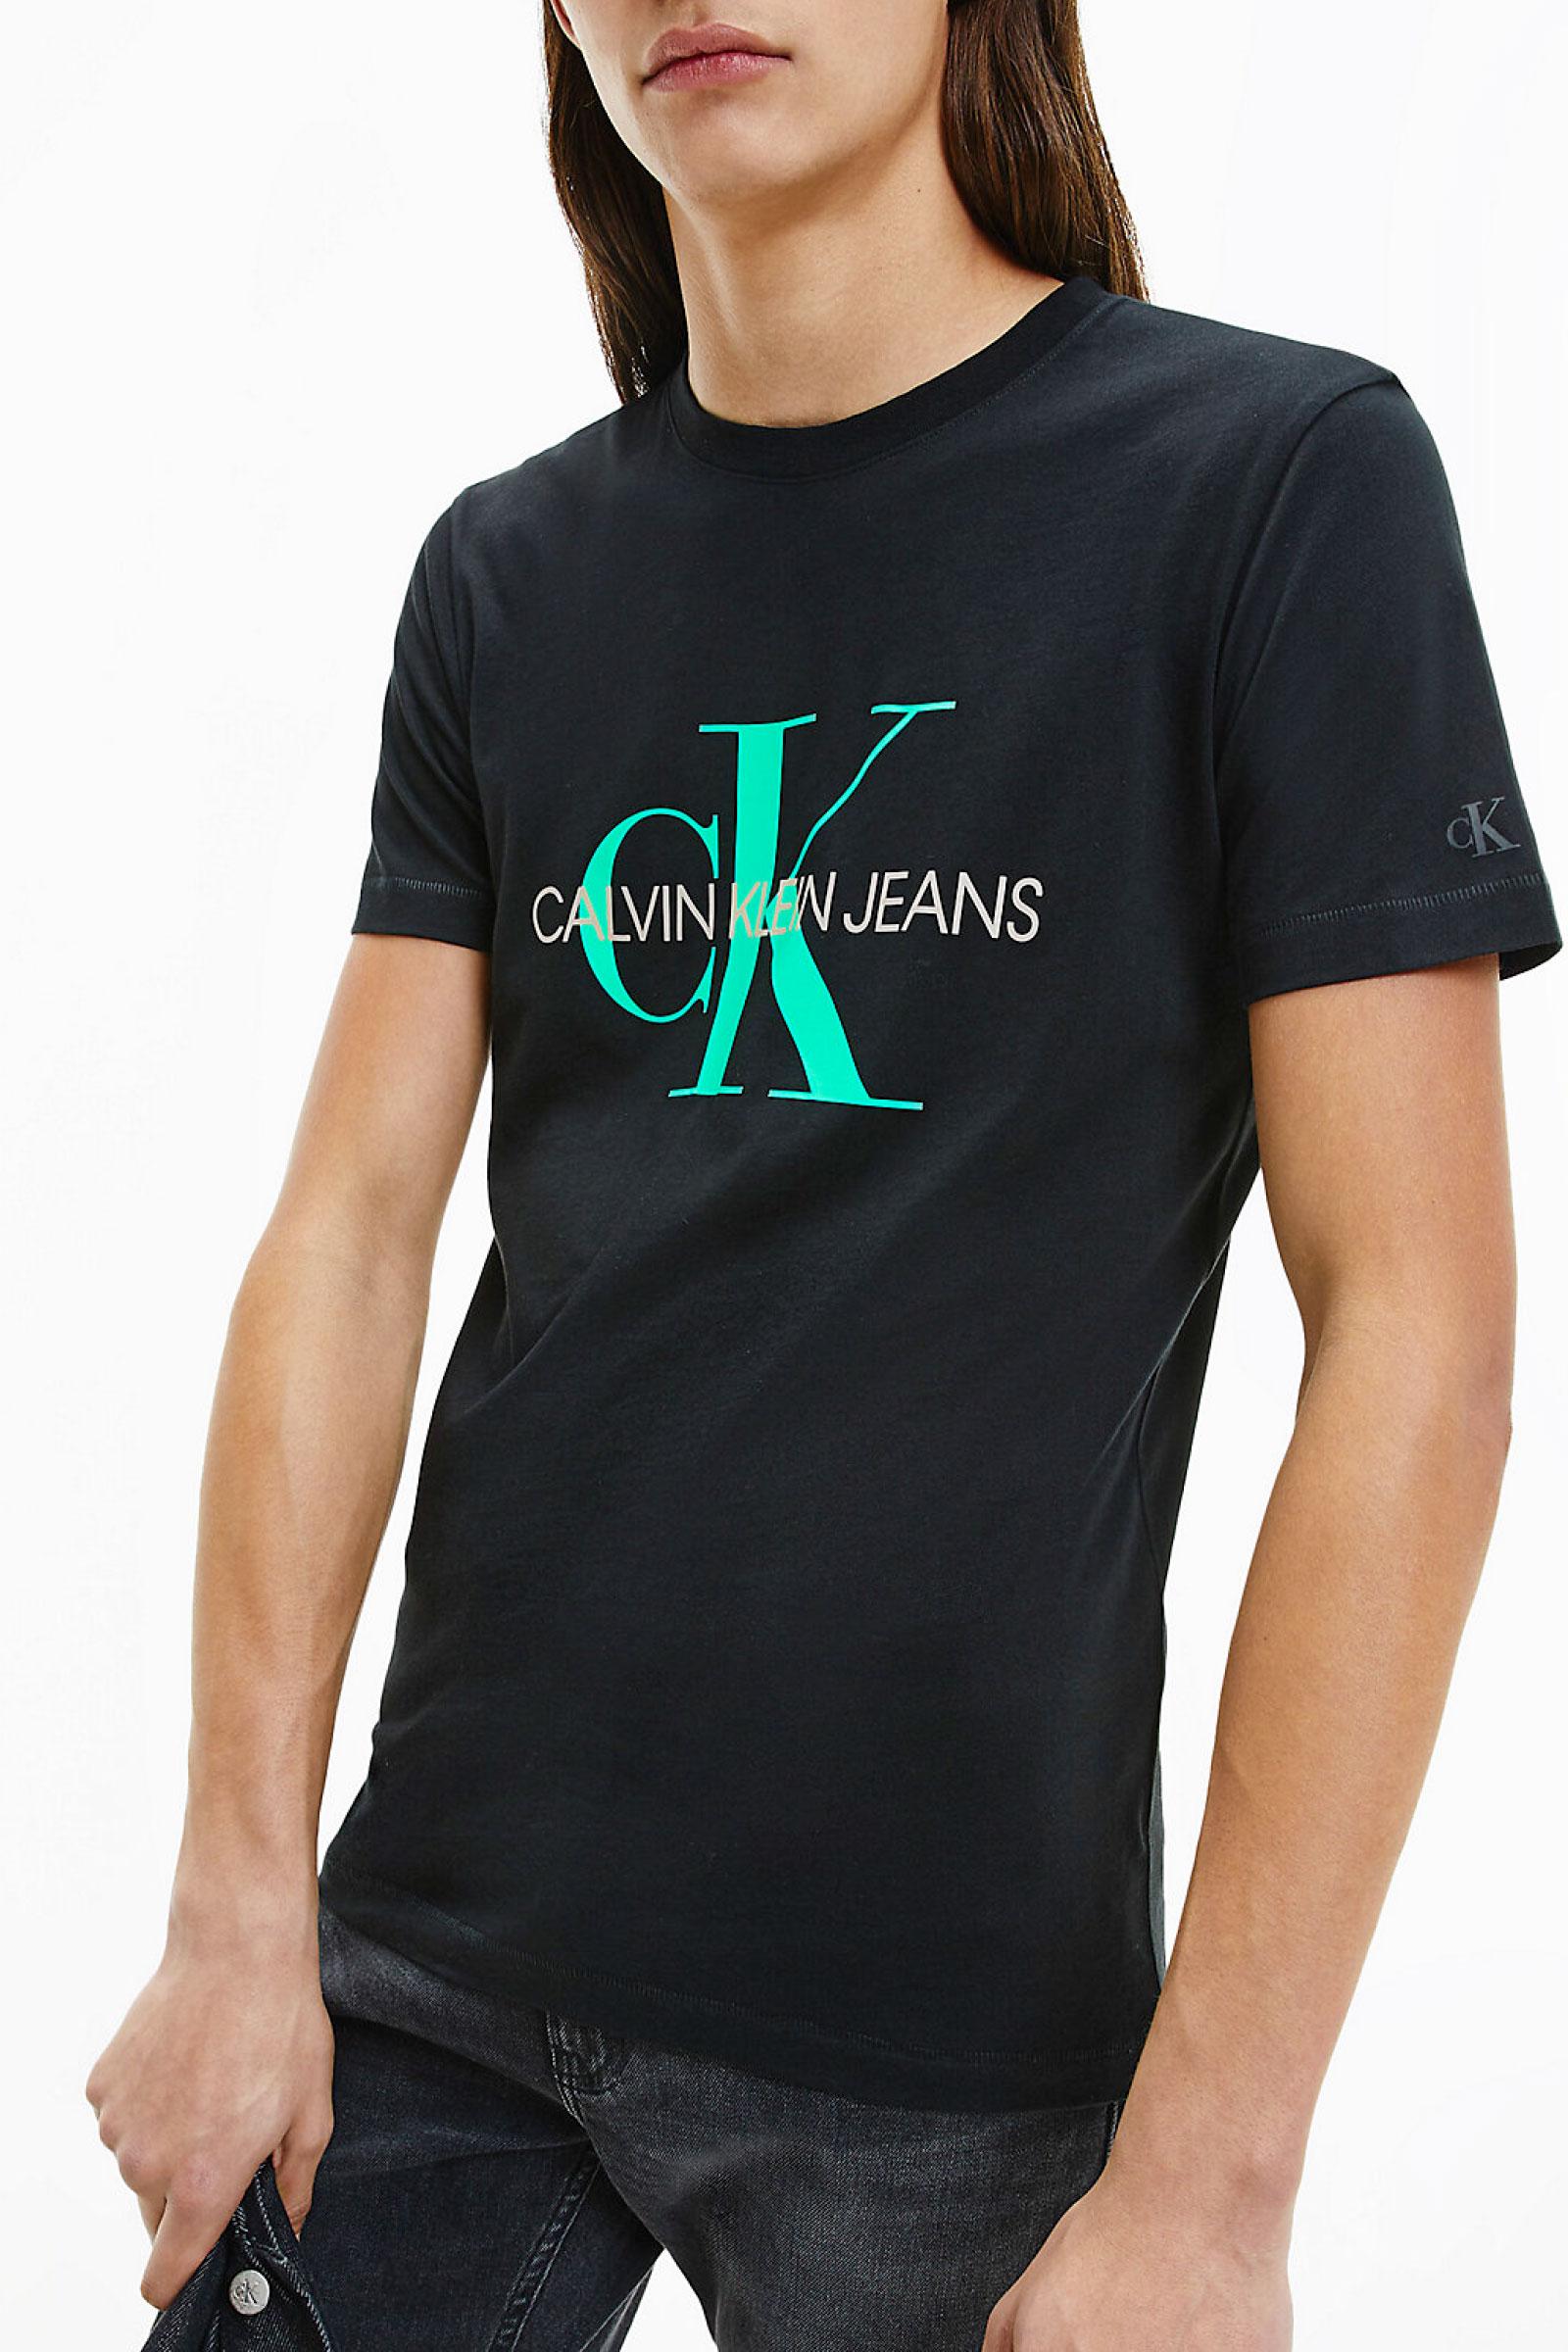 CALVIN KLEIN JEANS Men's T-Shirt CALVIN KLEIN JEANS | T-Shirt | J30J317065BEH